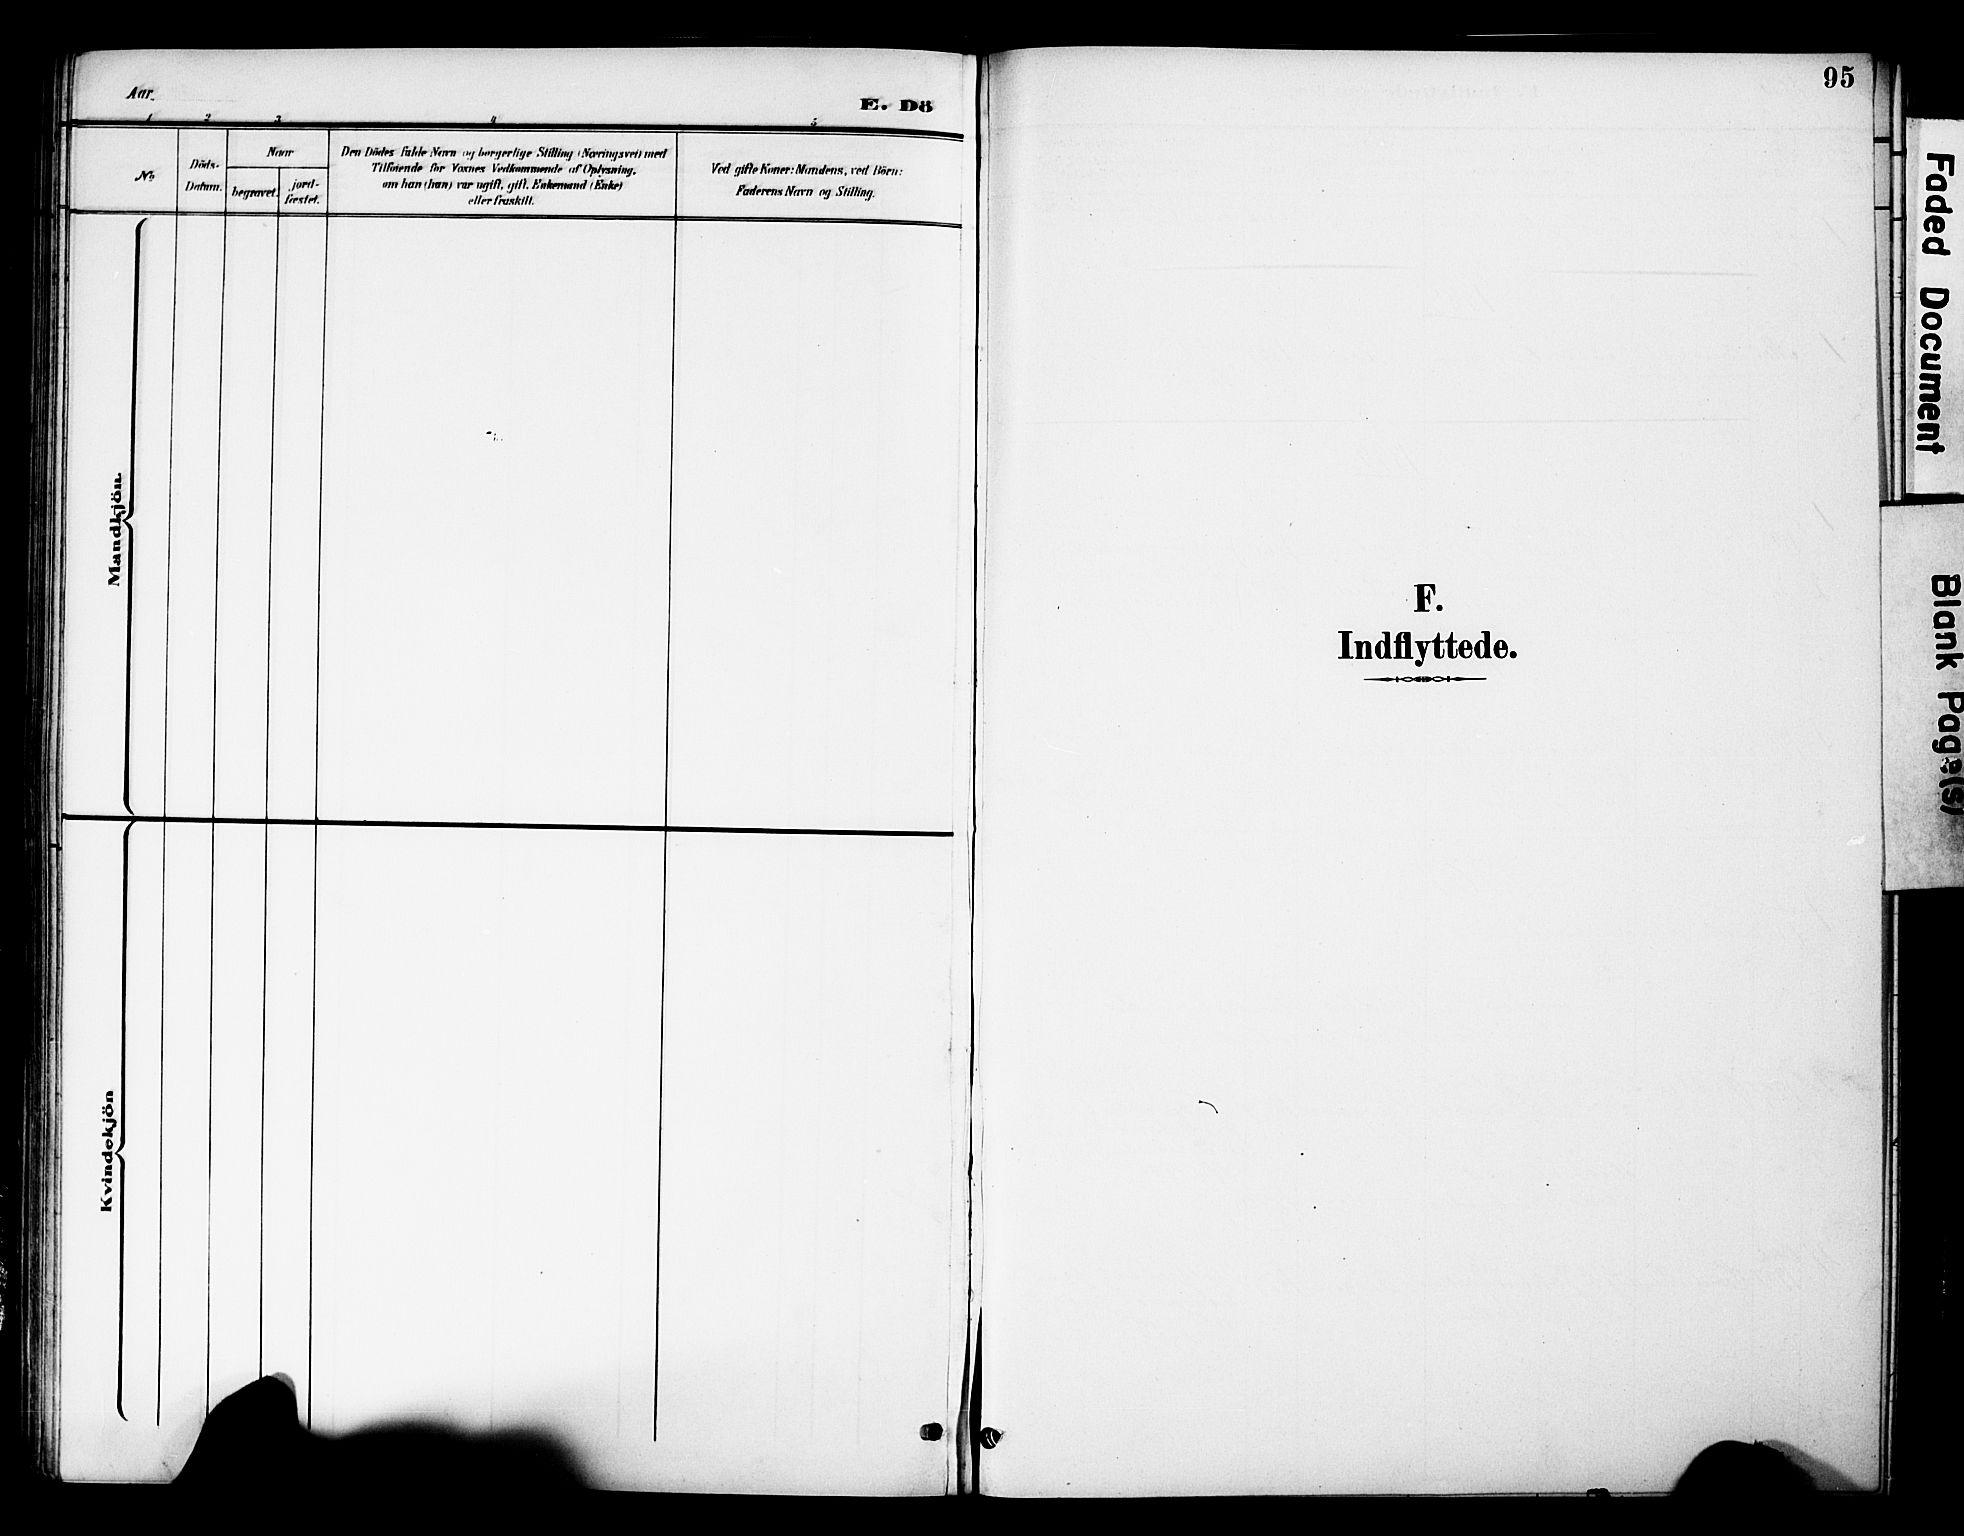 SAH, Øystre Slidre prestekontor, Klokkerbok nr. 5, 1887-1910, s. 95